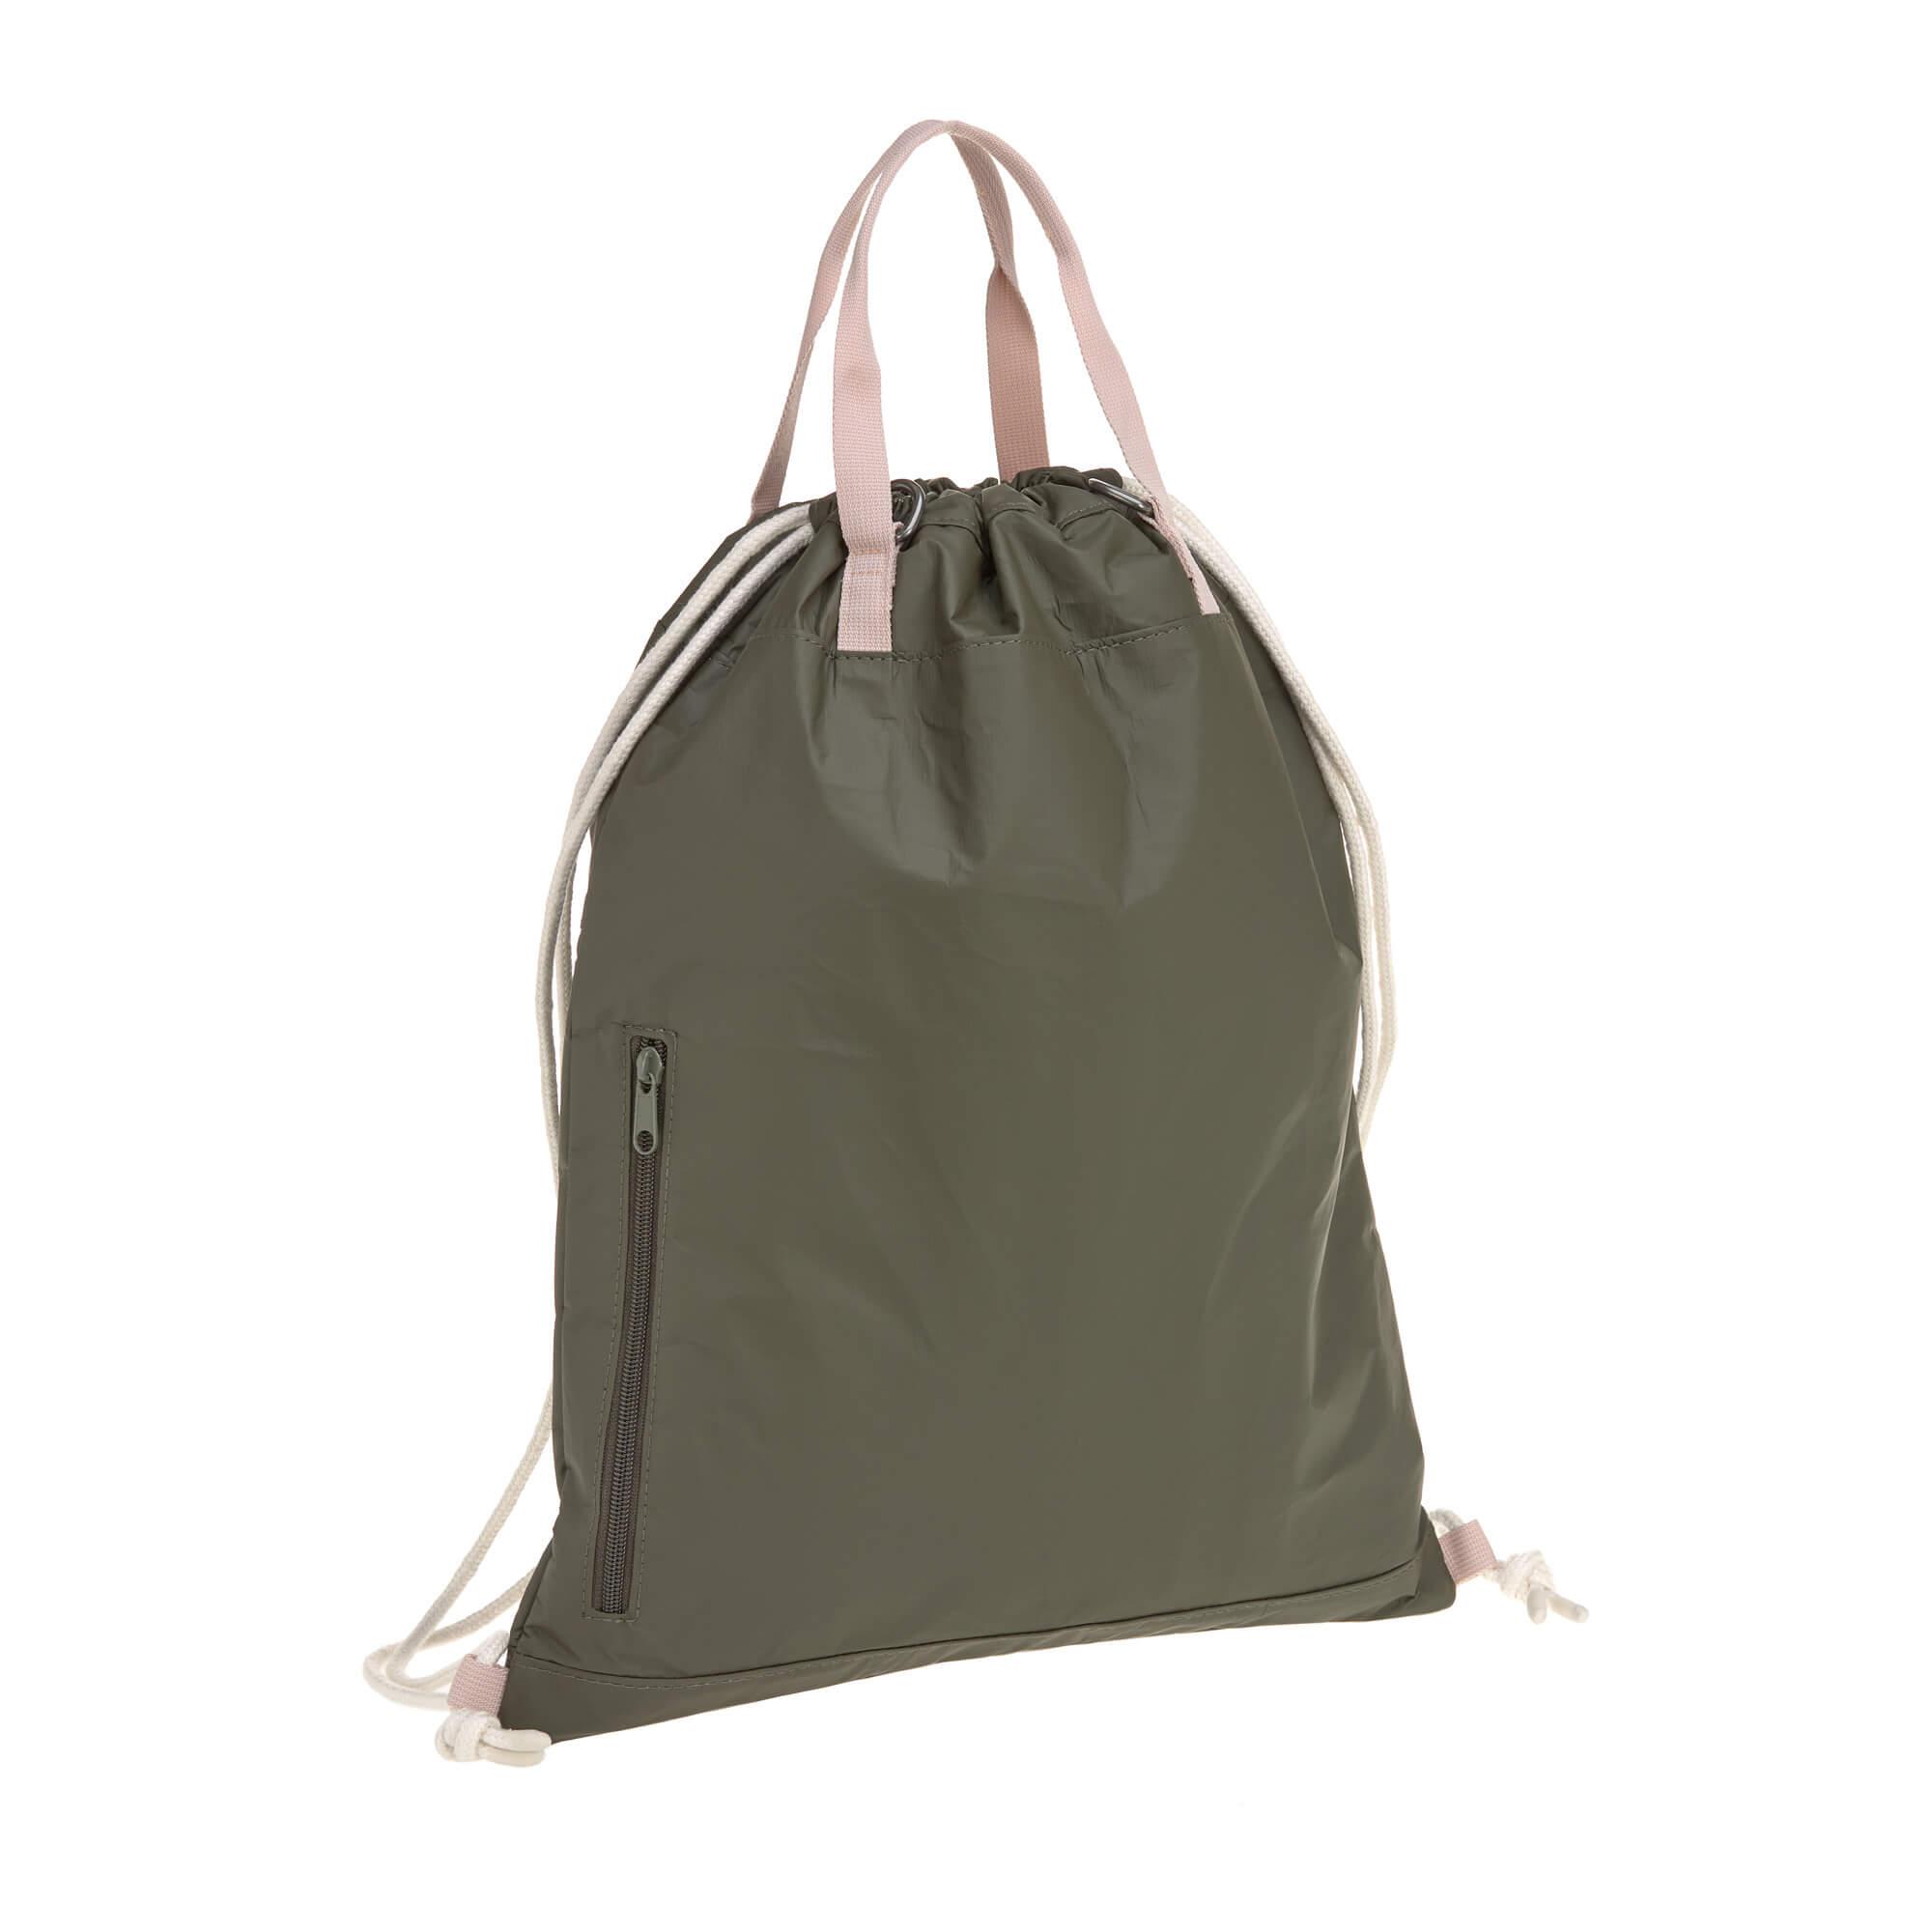 Lässig Wickelrucksack String Bag